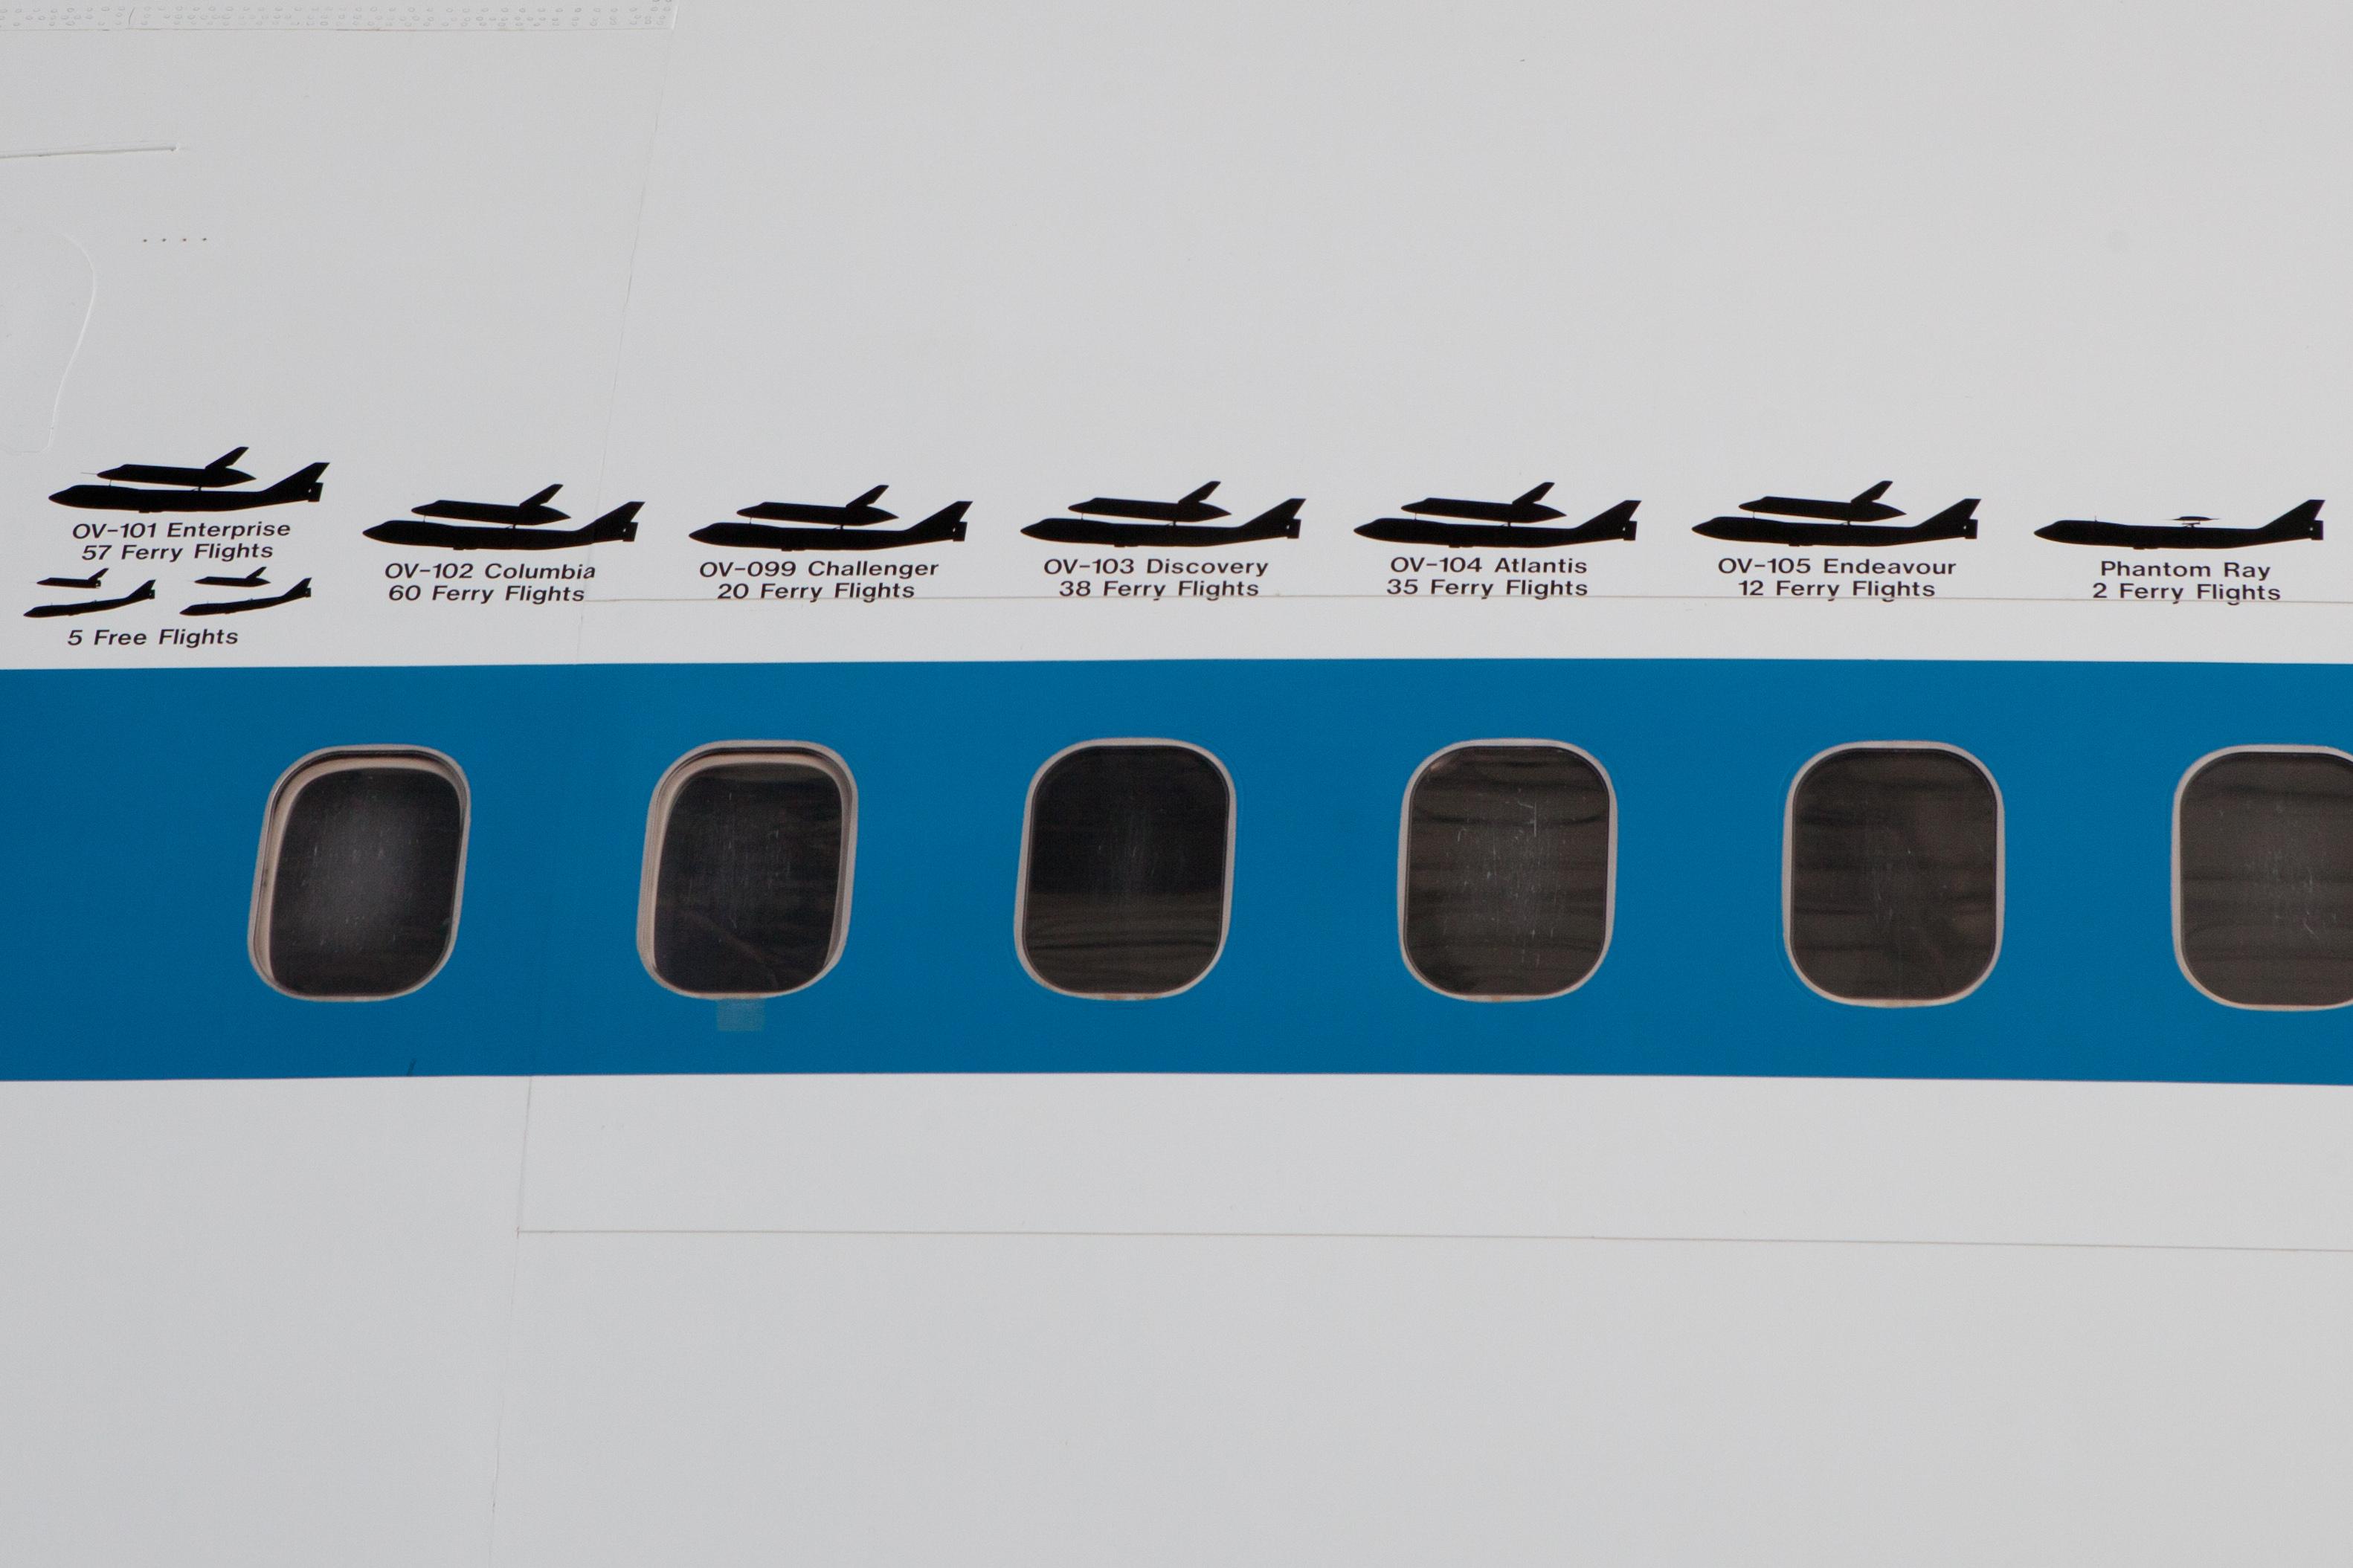 Shuttle_Carrier_Aircraft_-_Silhouettes.jpg